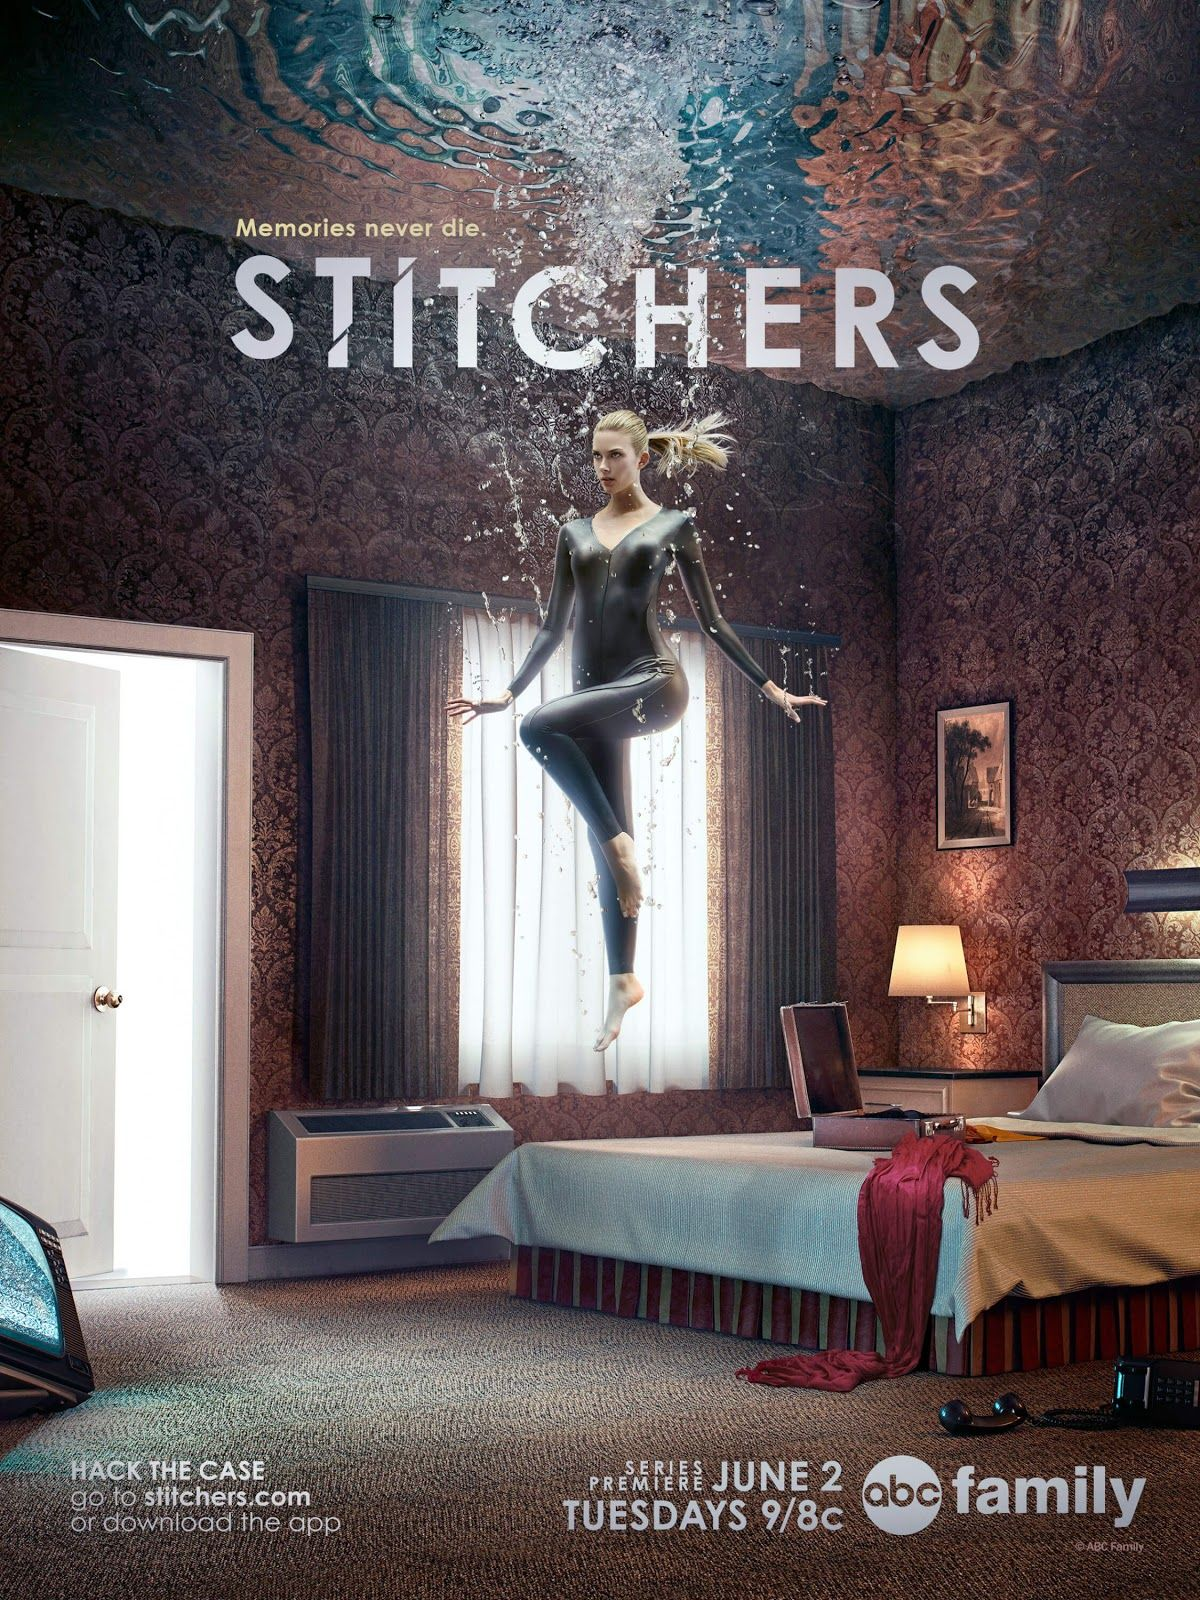 Gatotv Stitchers Piloto Descargar Películas Buenas Series Series